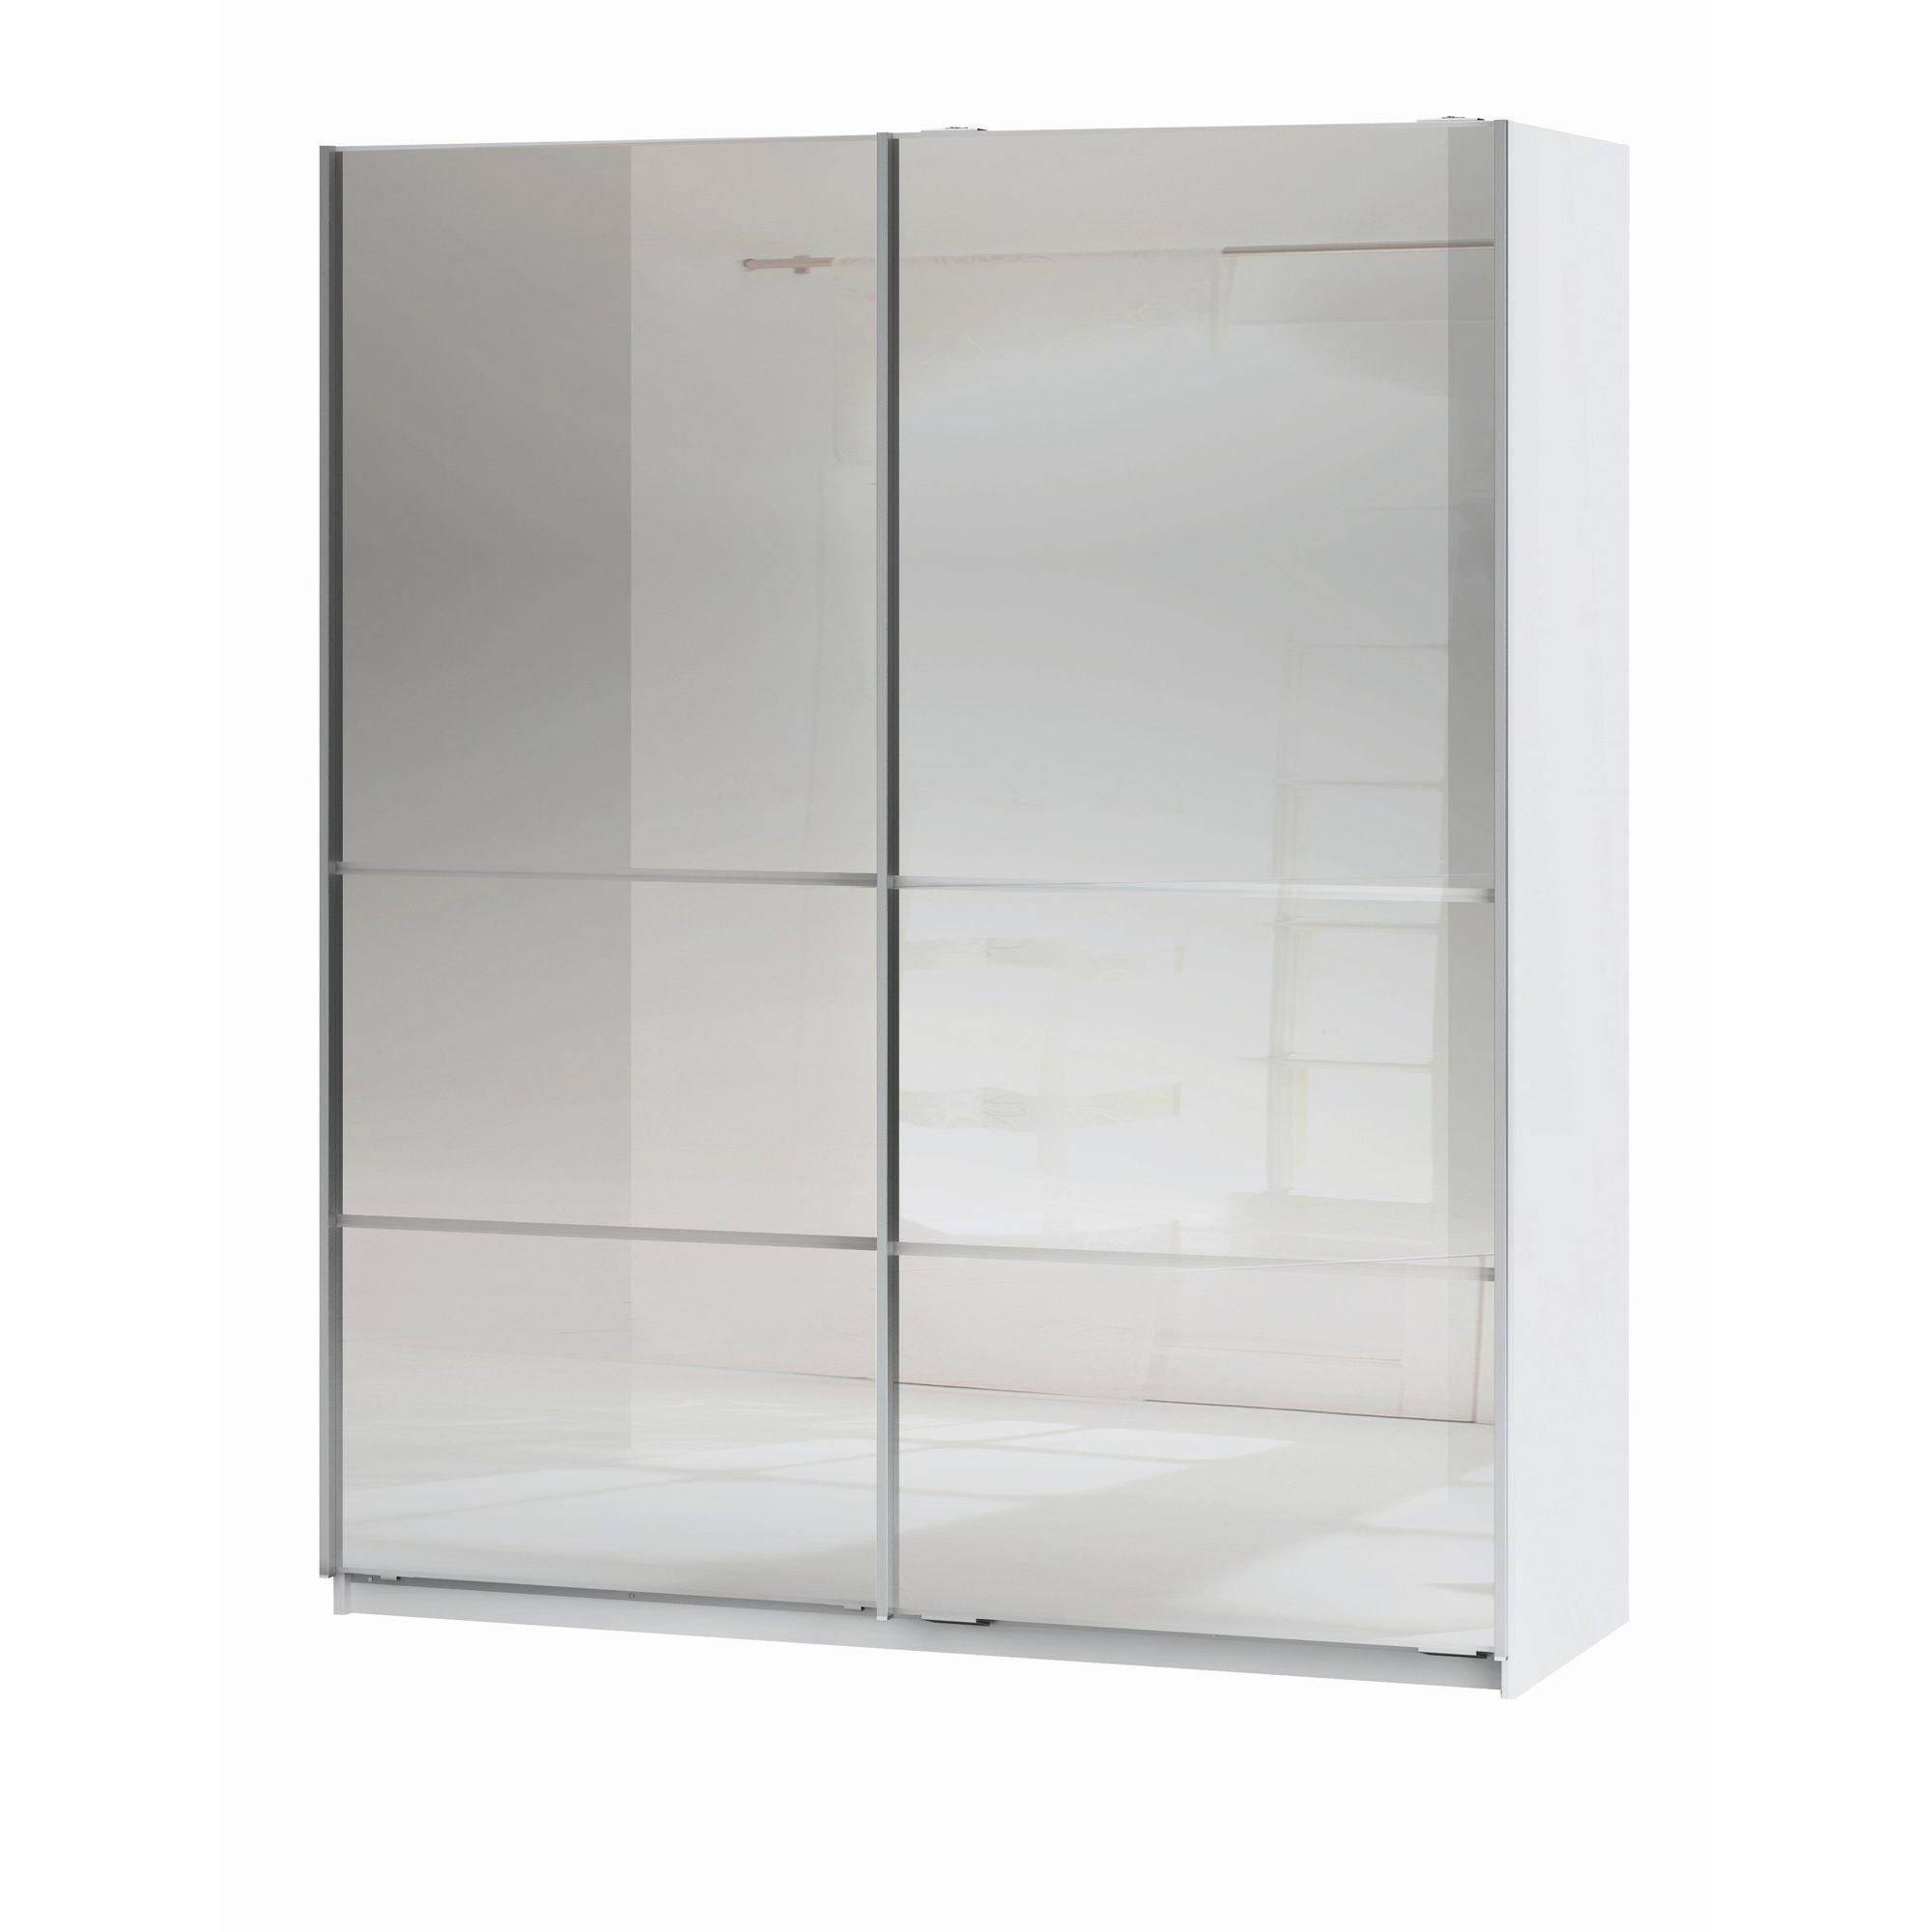 Altruna Space Double Mirror Slider Wardrobe at Tesco Direct